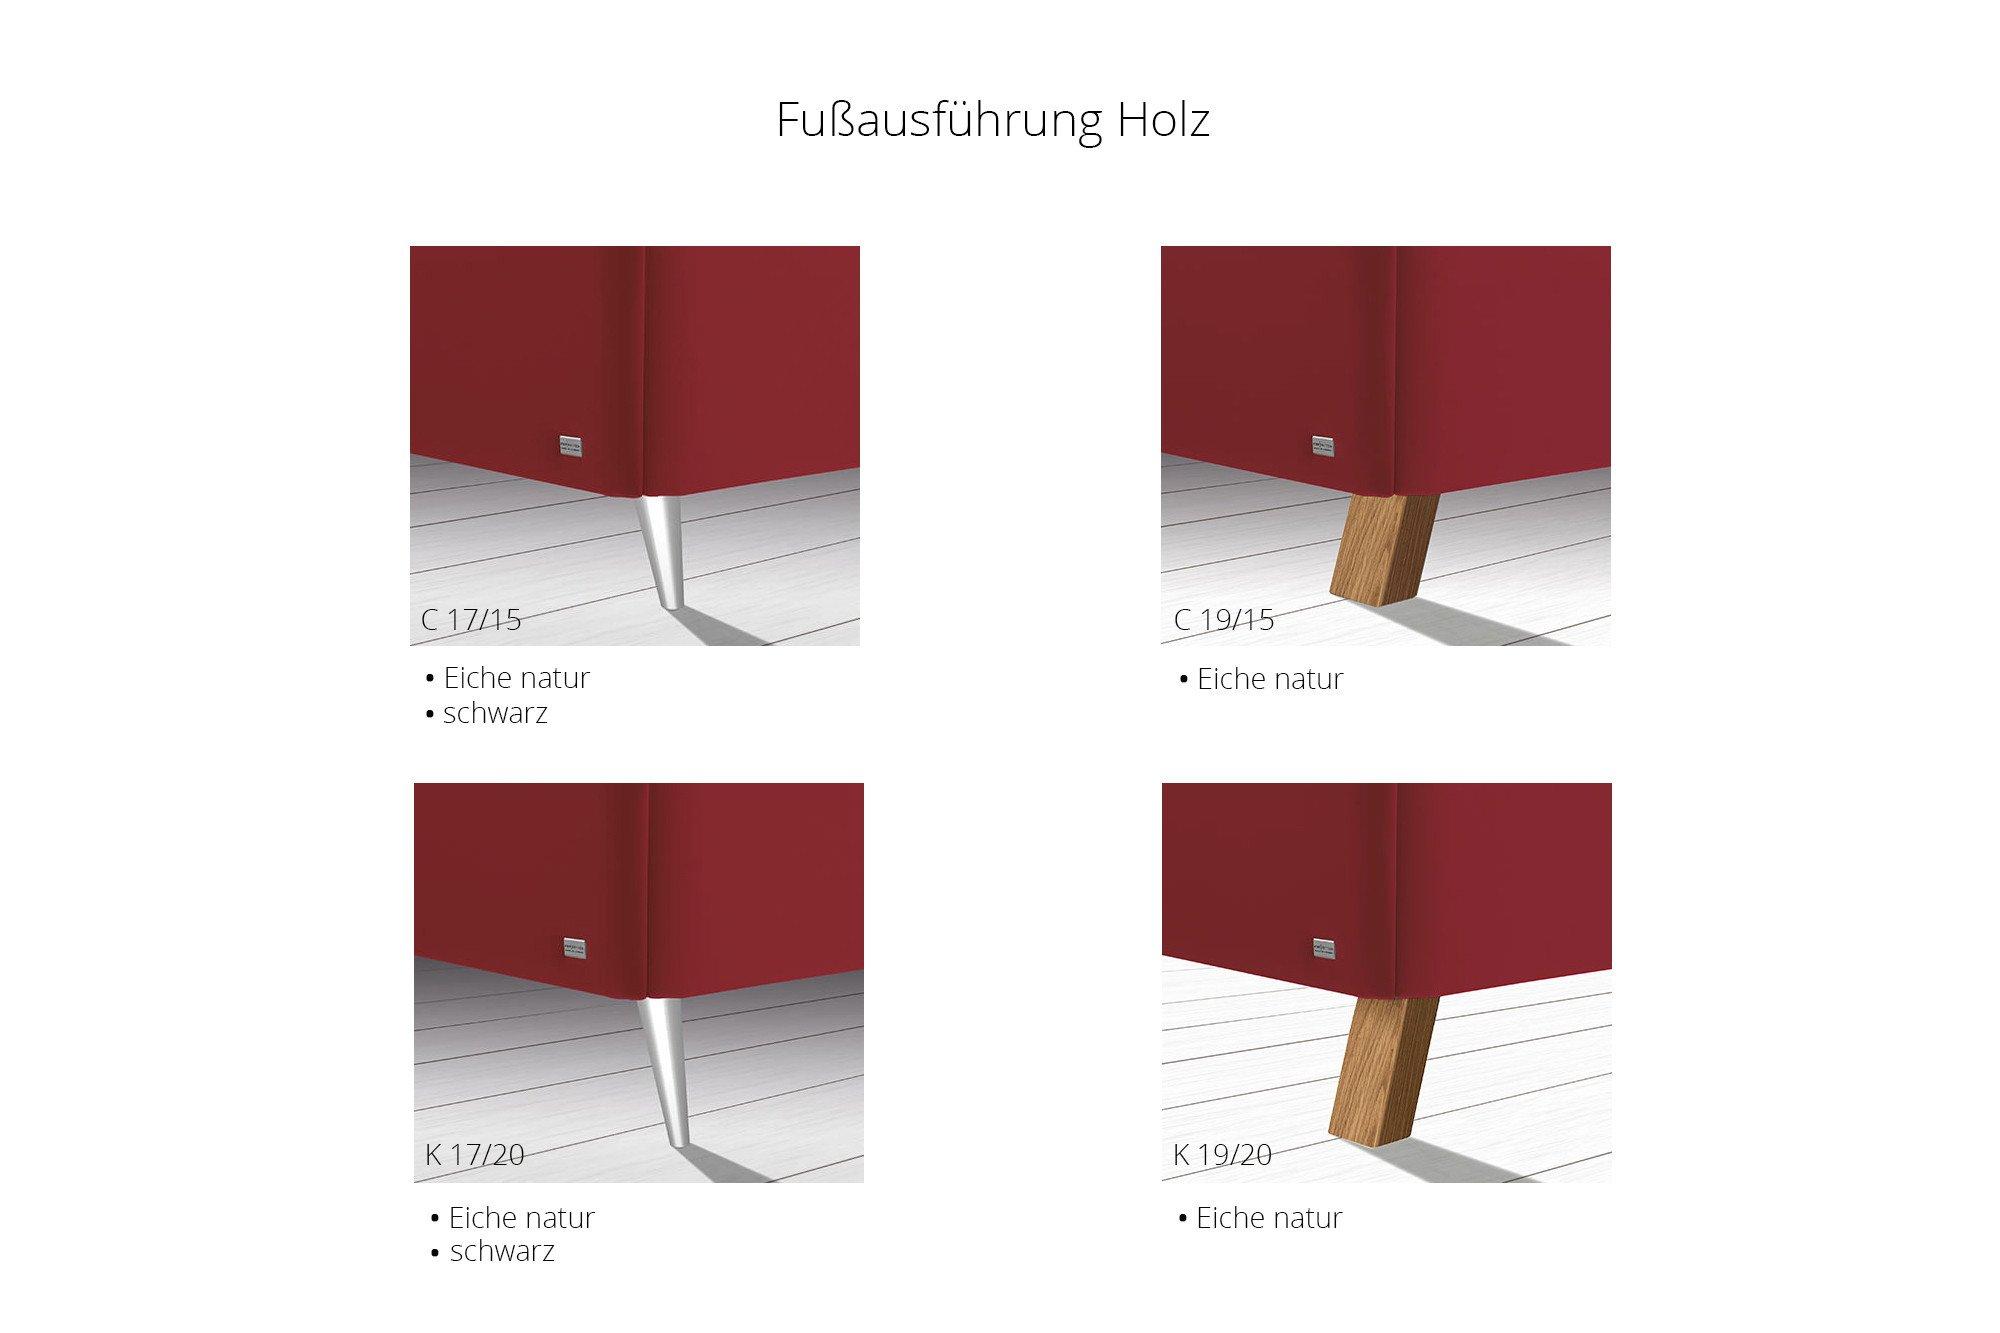 ruf betten online bett polster haus mobel gunstig online im online shop kaufen with ruf betten. Black Bedroom Furniture Sets. Home Design Ideas